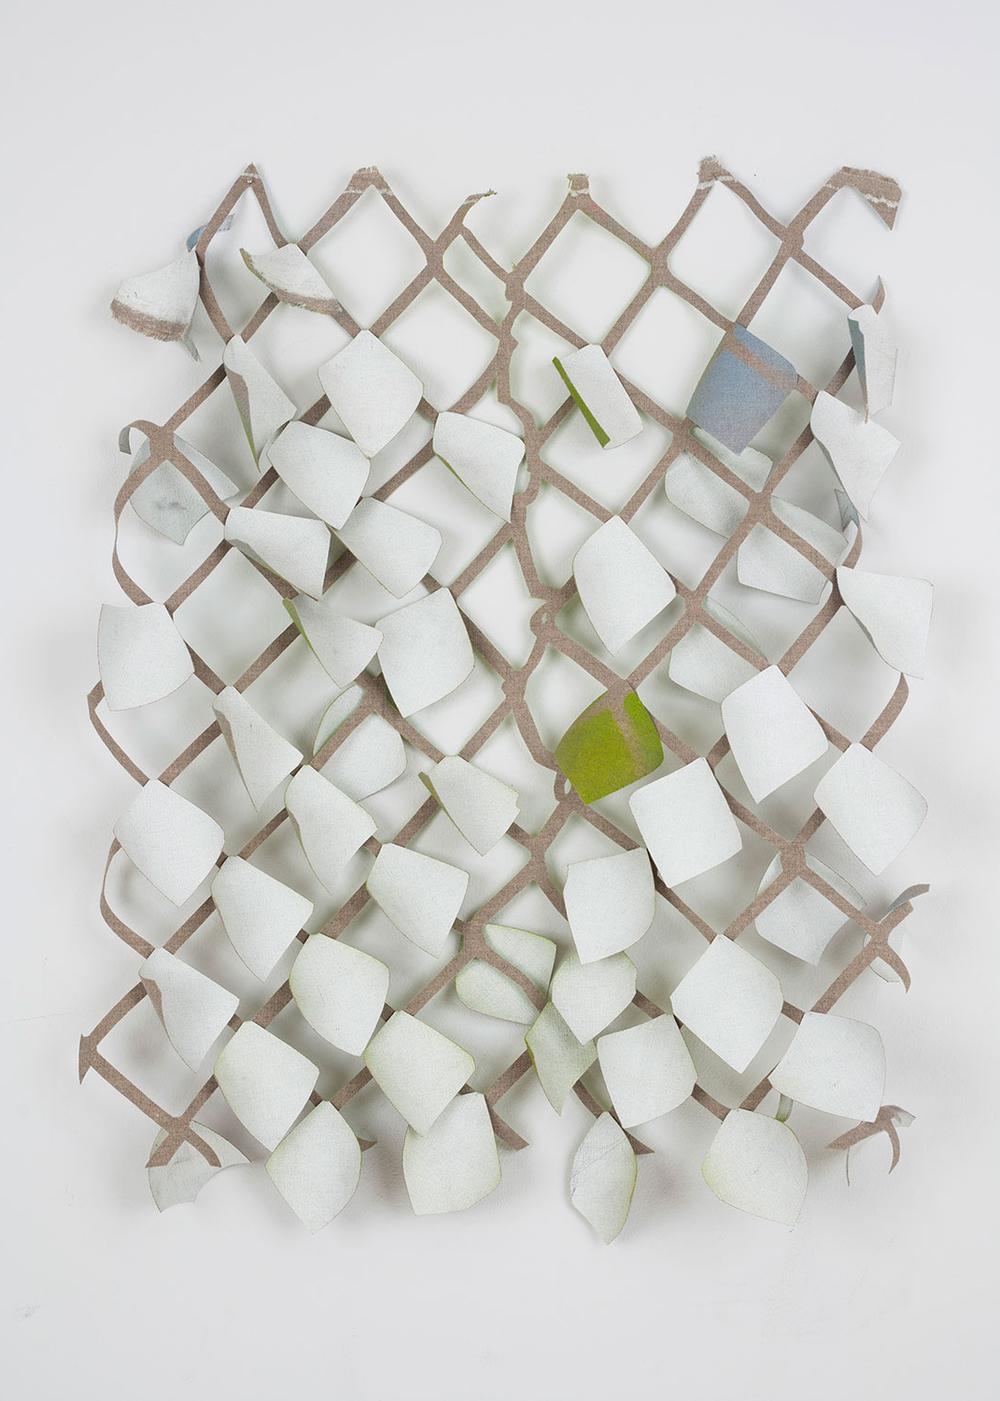 kim-beck-fences-16.jpg